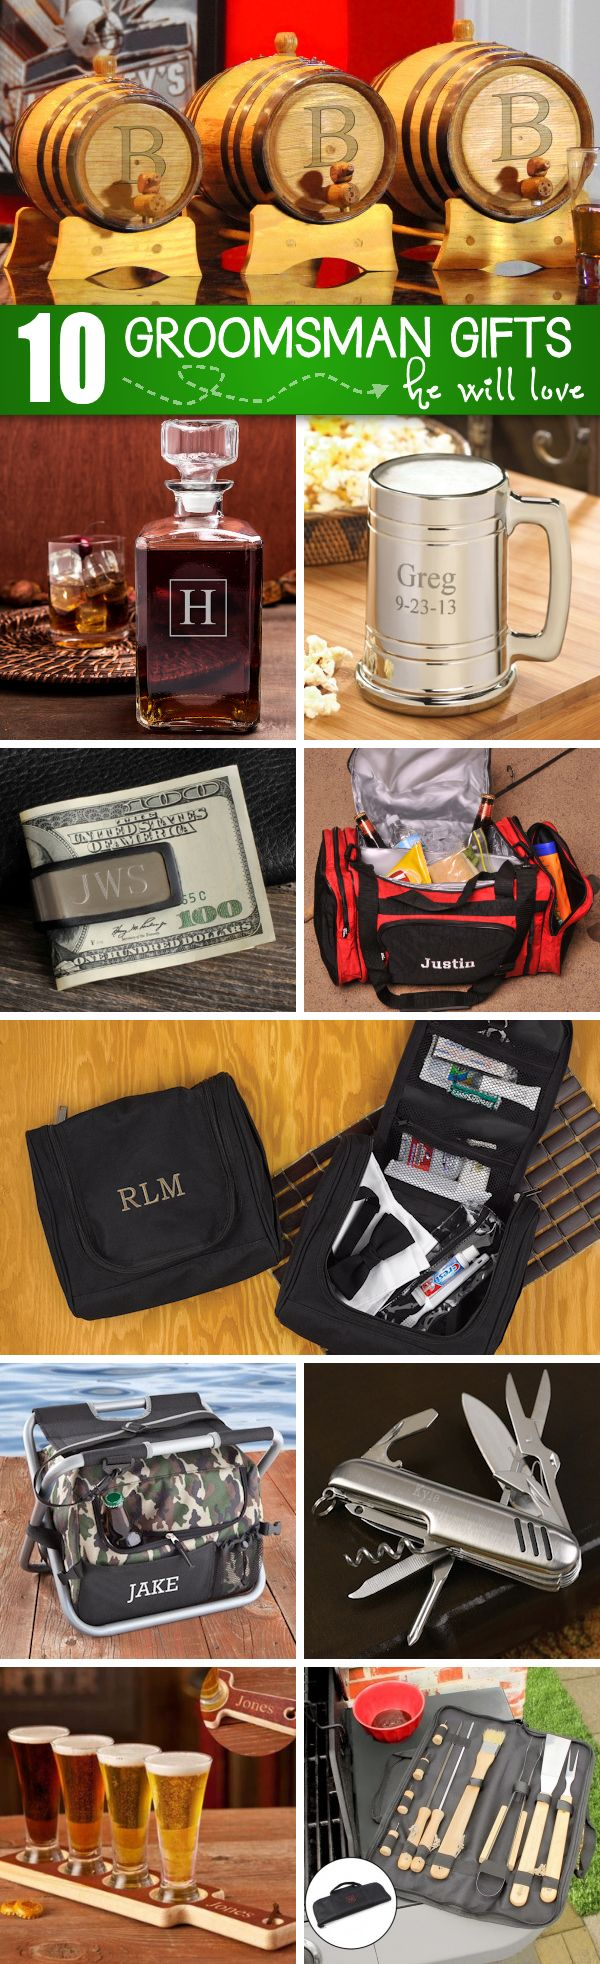 10 Groomsmen Gifts that He'll Love!